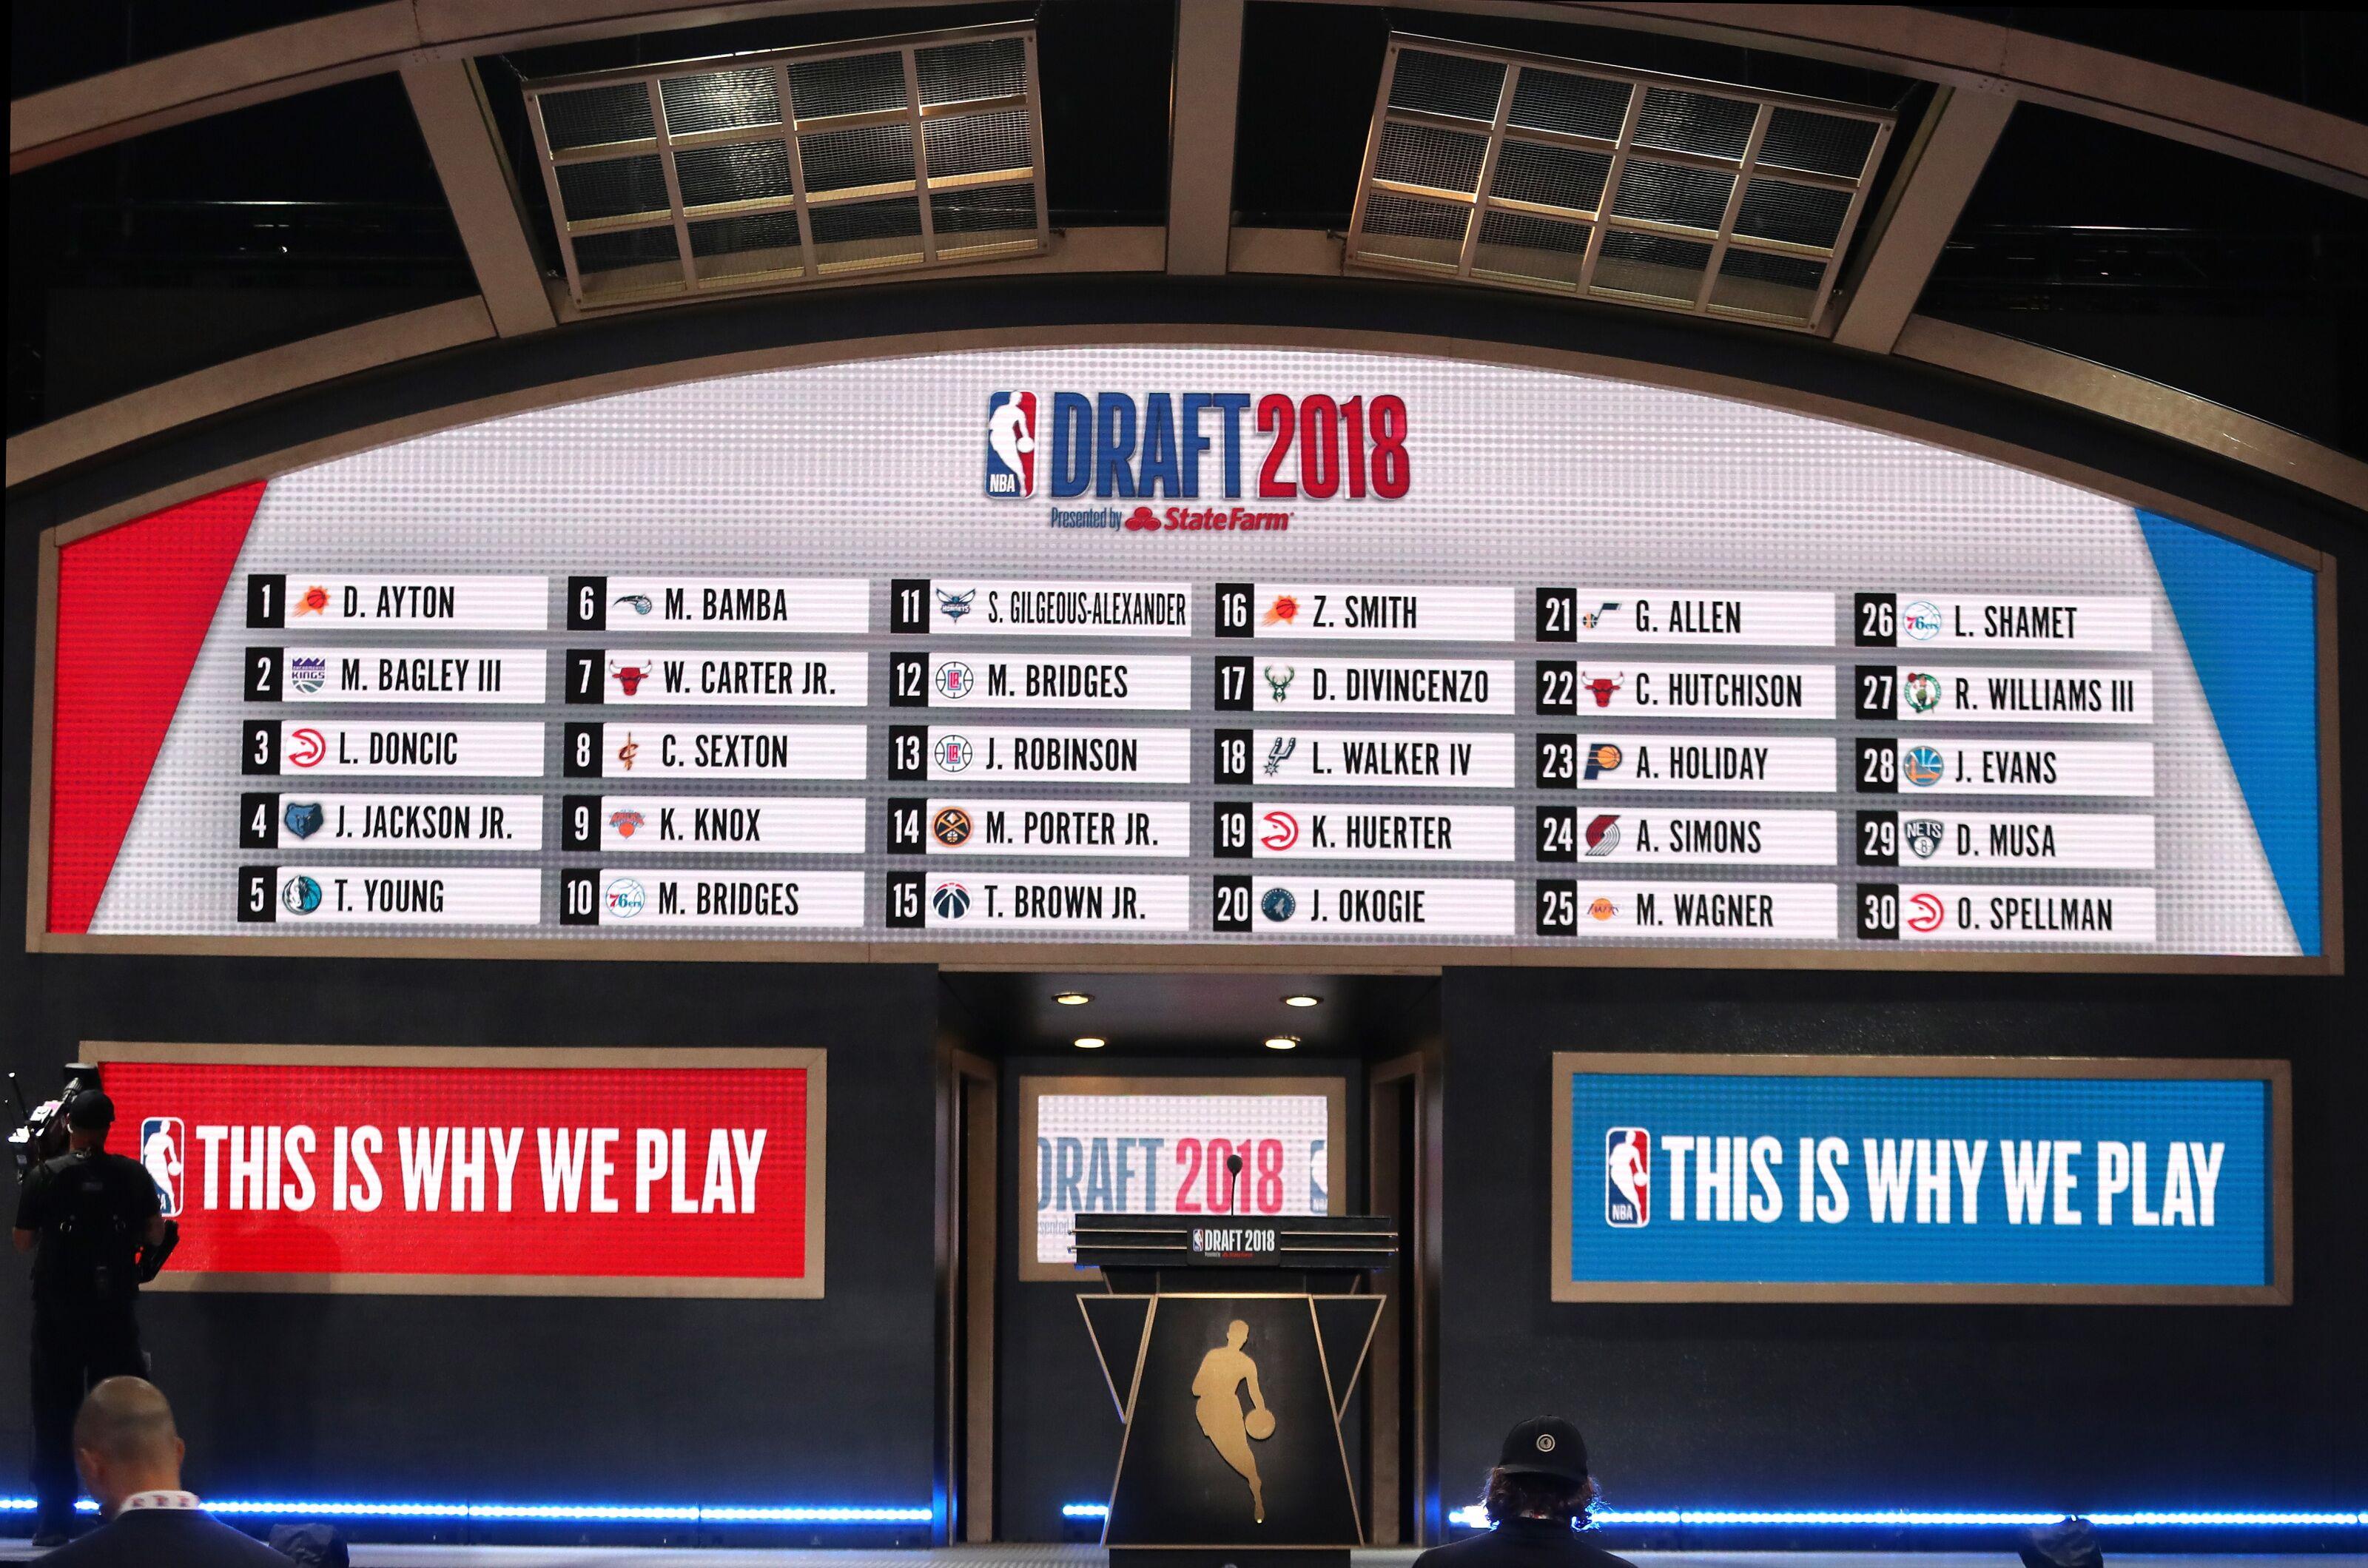 NBA Draft 2019: Best draft picks from No. 1-30 since 2000